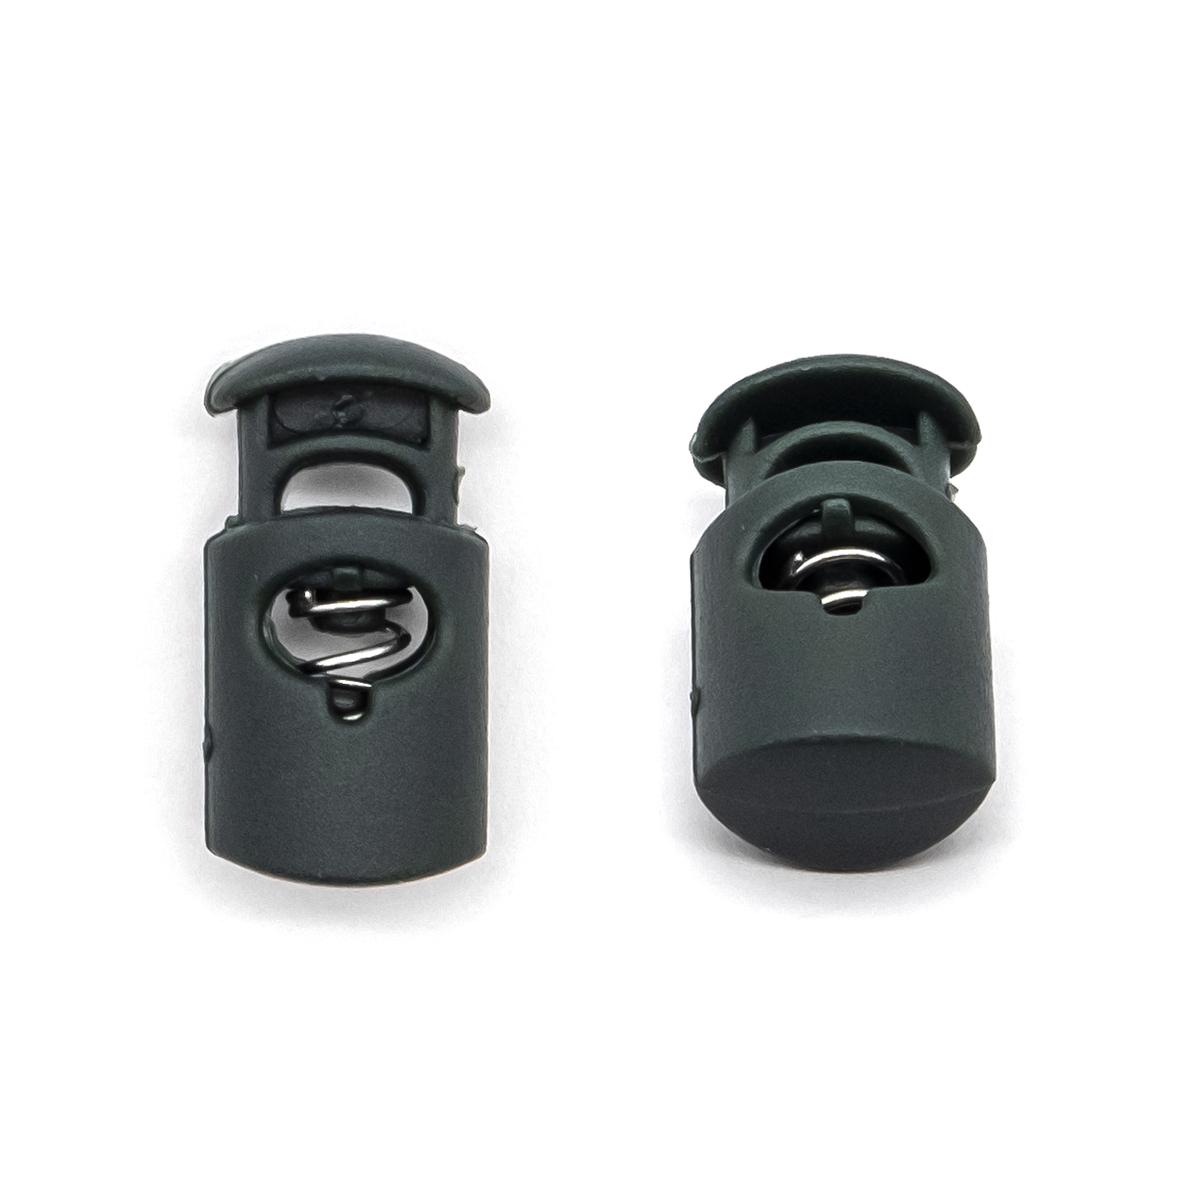 0305-3005 Стопор 'Цилиндр' d=7,5мм, 27*13,5мм, пластик